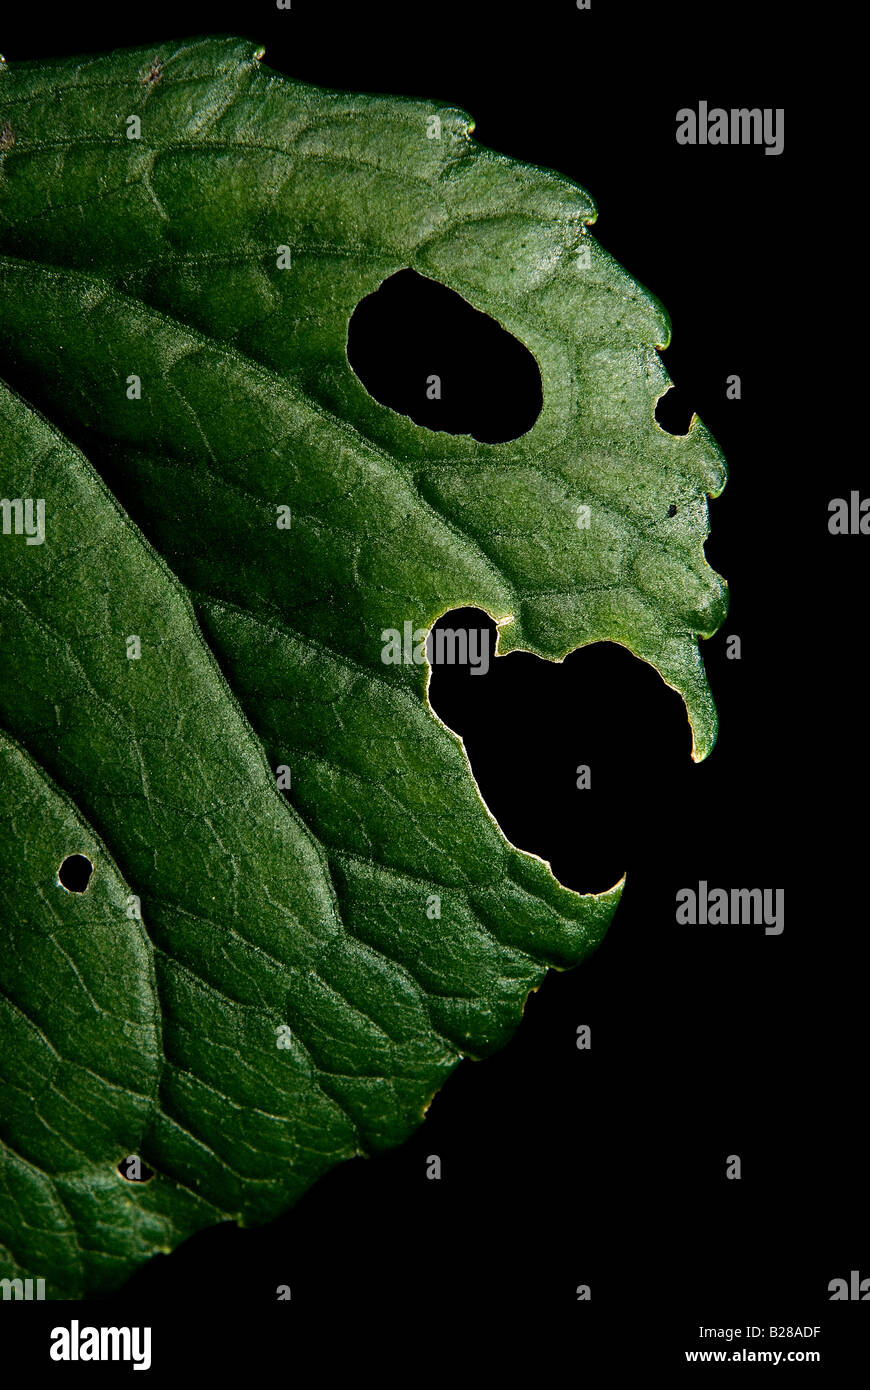 Grüne Pflanze. Blatt-Gesicht. 2008 Stockbild